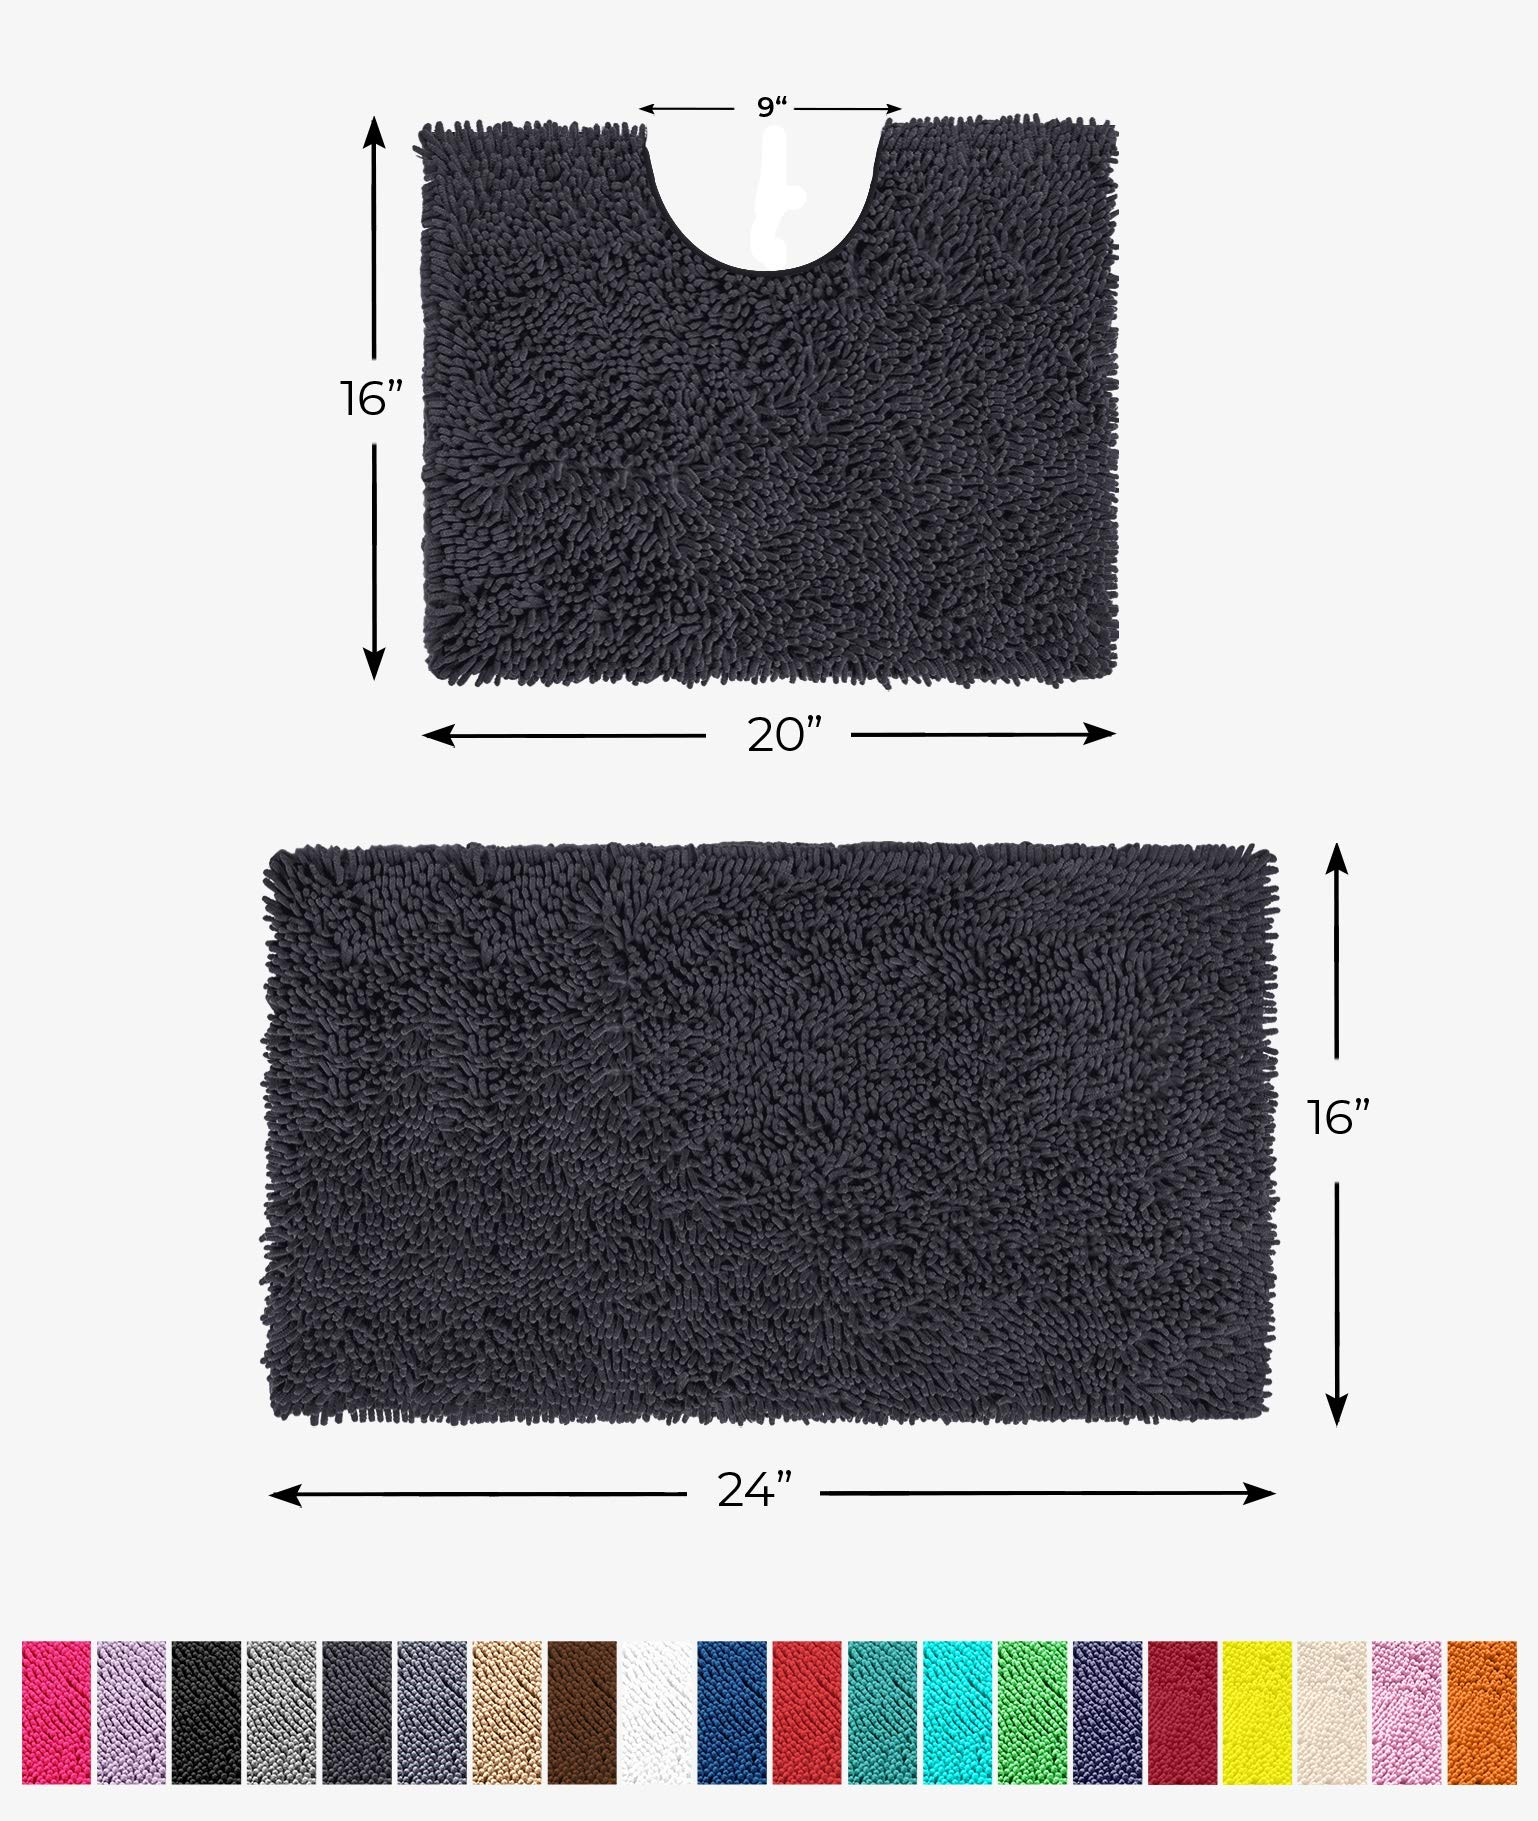 LuxUrux Bathroom Rugs Luxury Chenille 2-Piece Bath Mat Set, Soft Plush Anti-Slip Bath Rug +Toilet Mat.1'' Microfiber Shaggy Carpet, Super Absorbent (Curved Set Small, Charcoal)